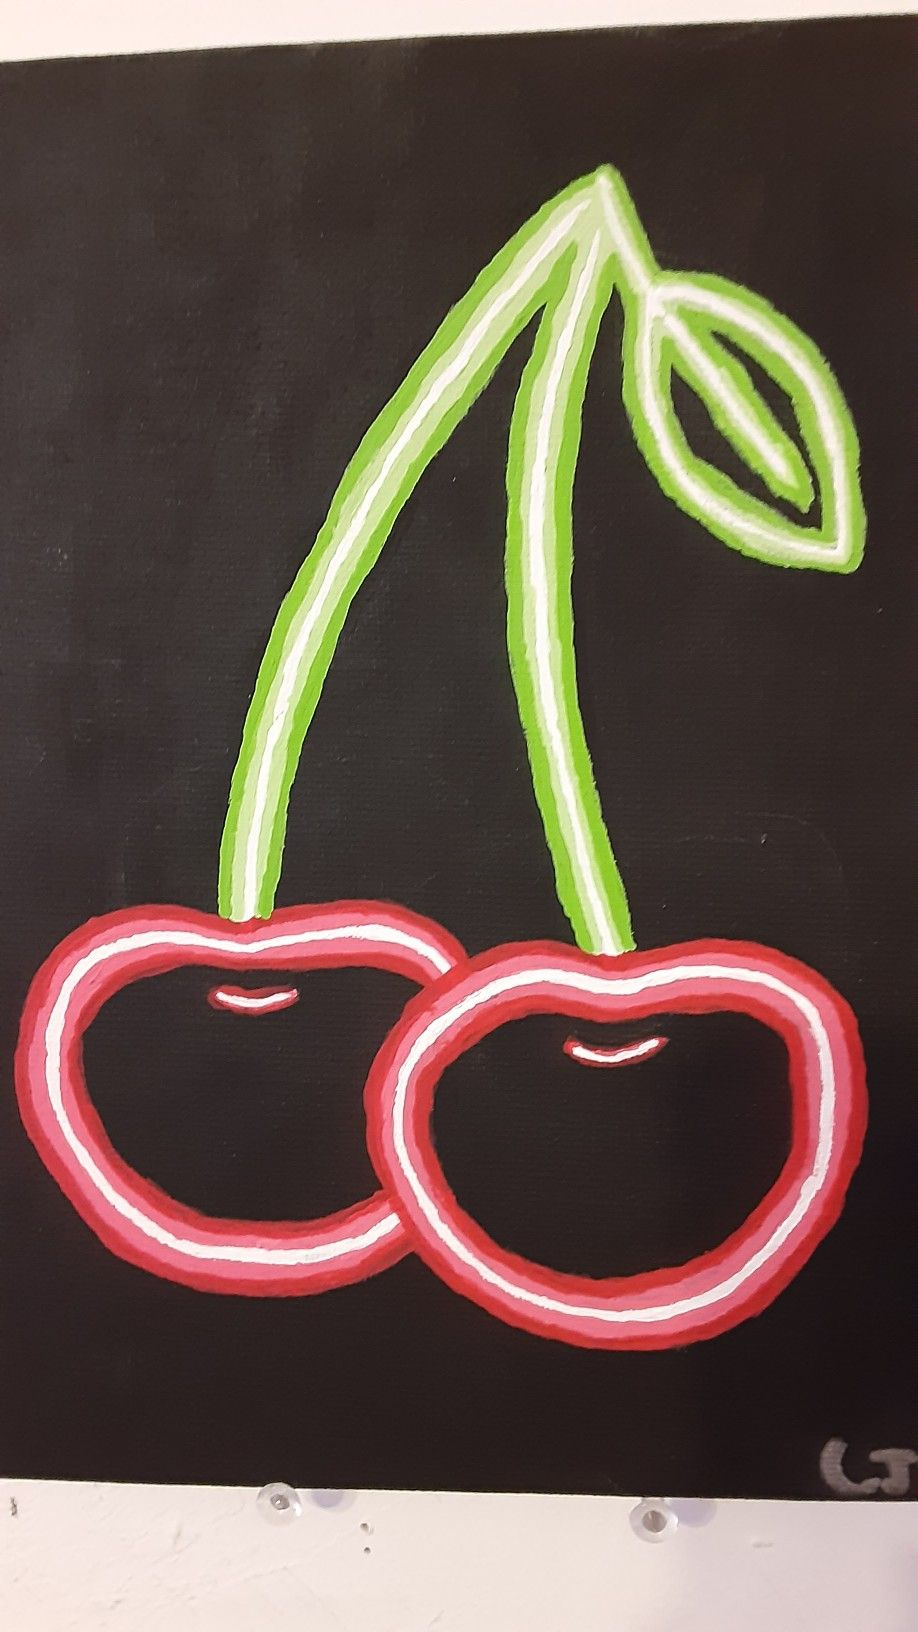 Cherry Neon Sign Painting Diy Canvas Art Painting Neon Art Painting Neon Sign Art